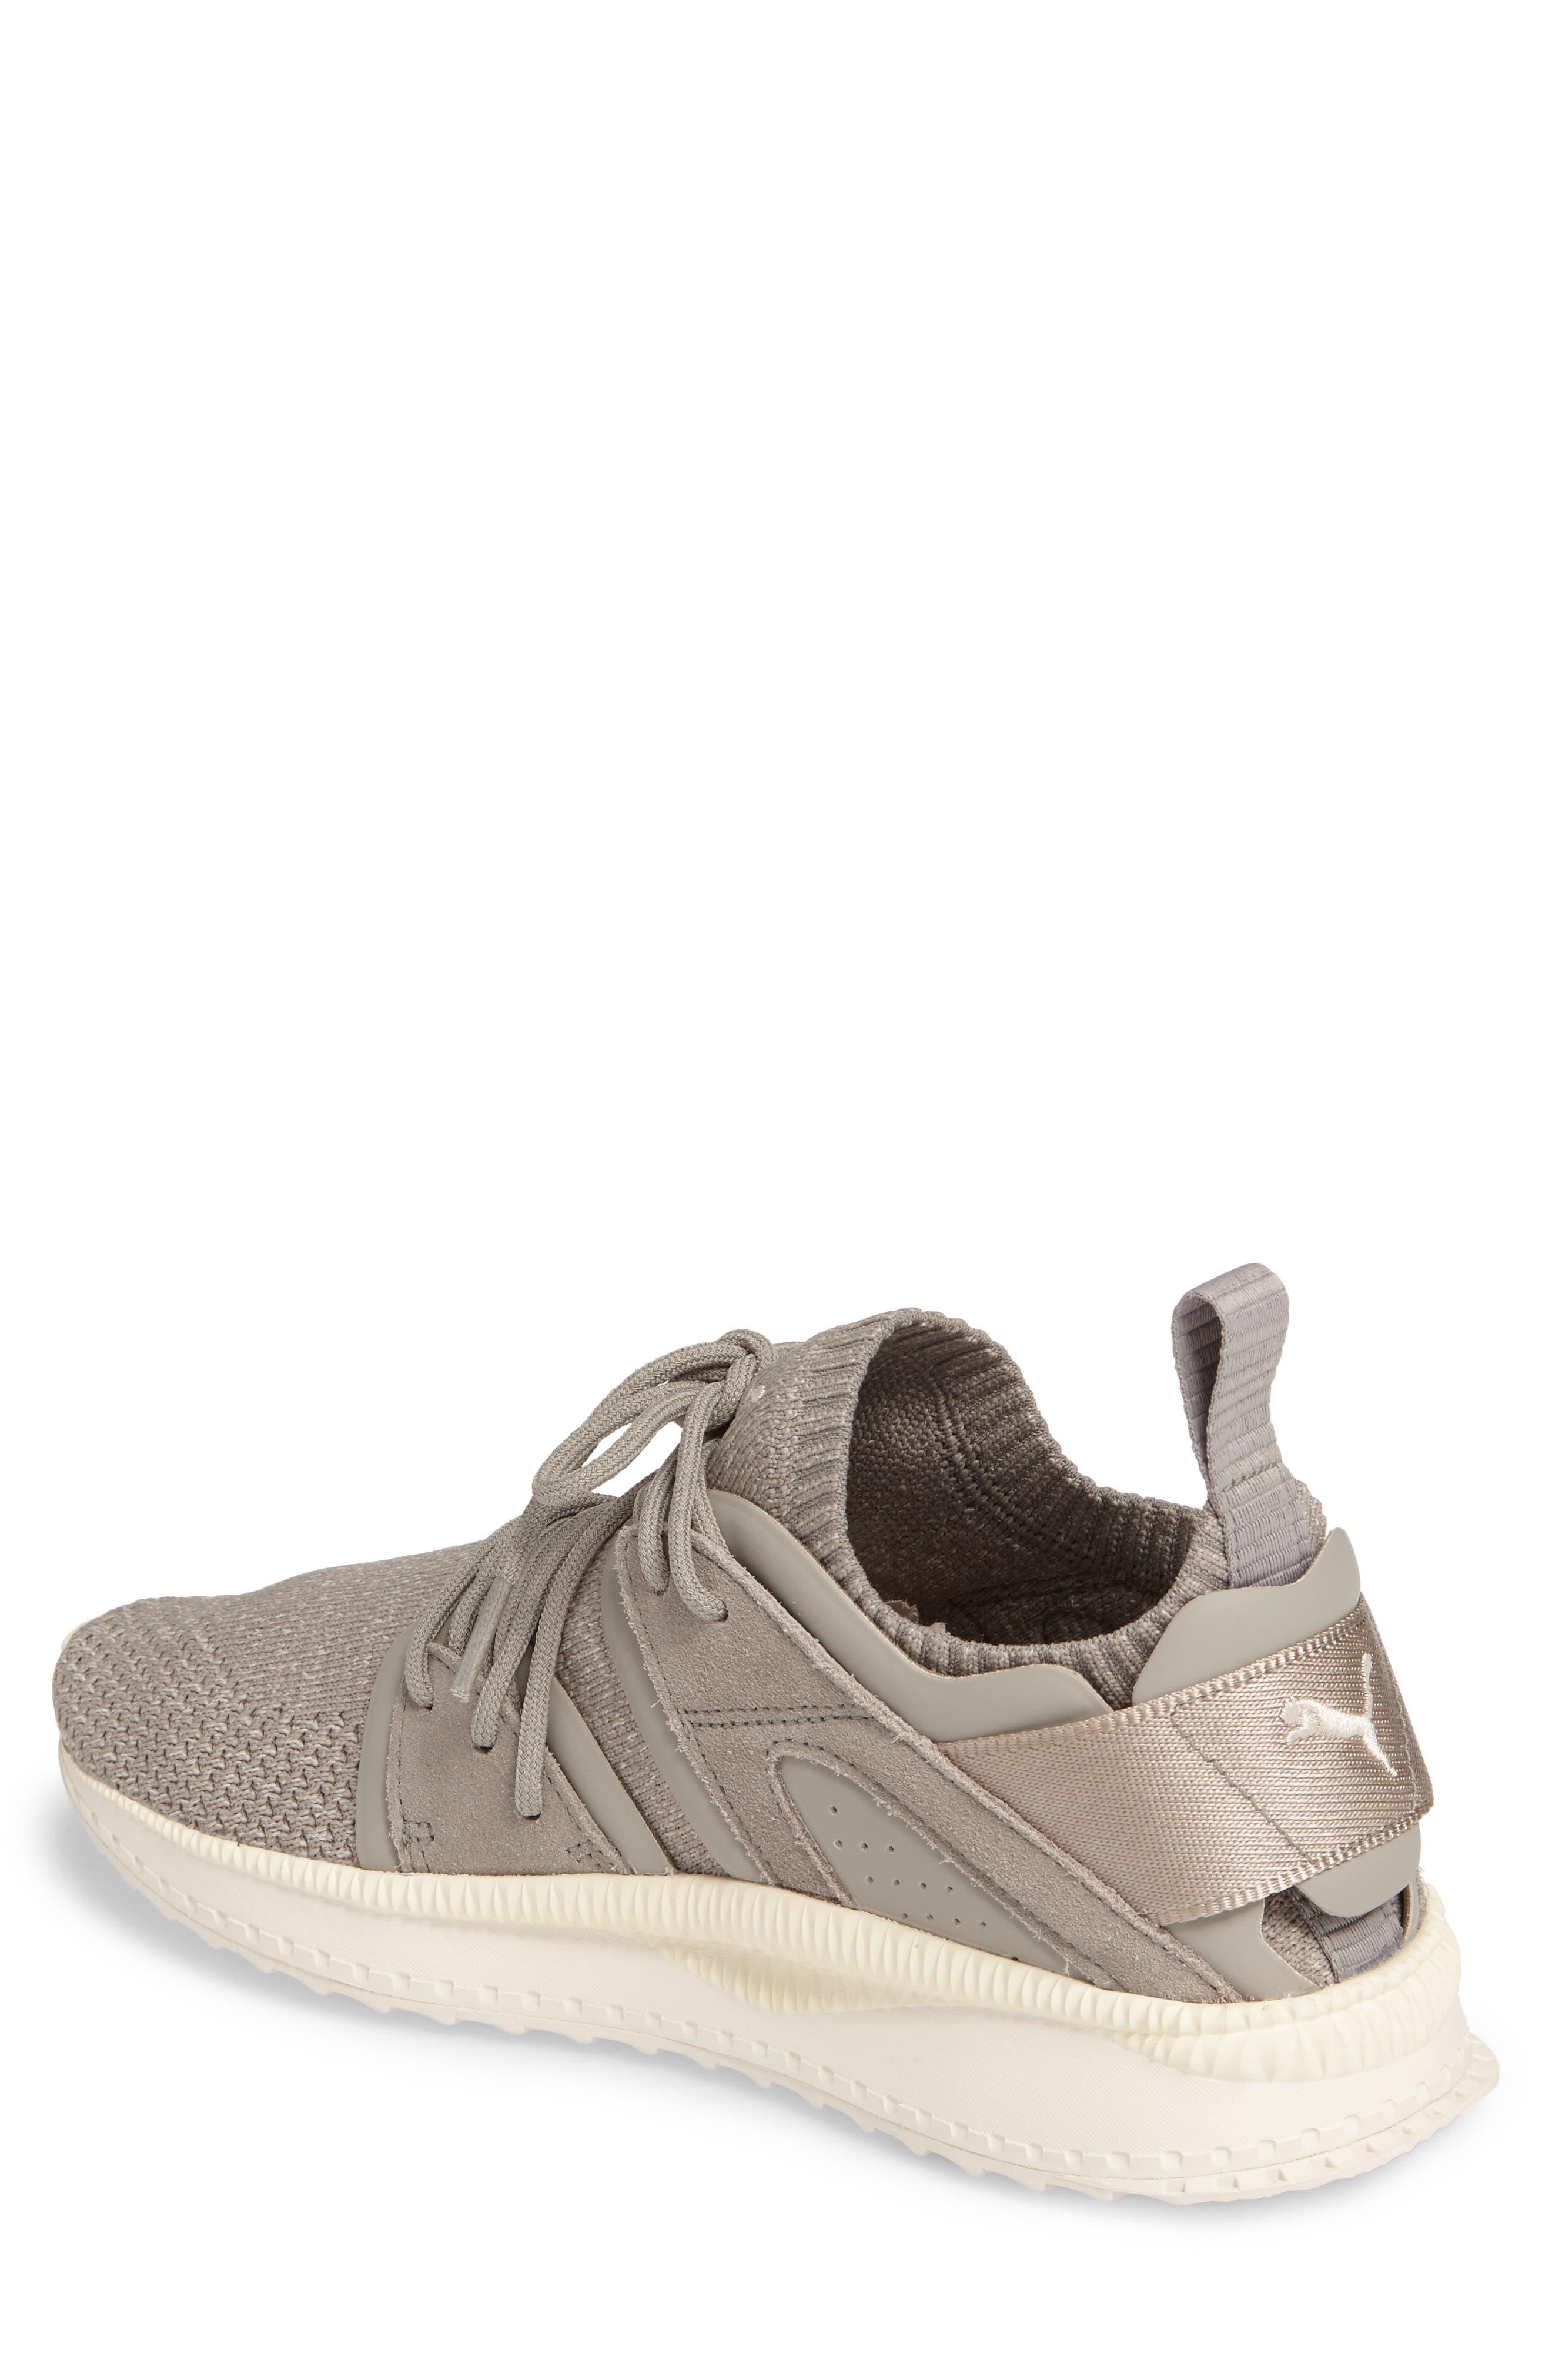 Tsug Blaze Evoknit Sneaker,                             Alternate thumbnail 2, color,                             253